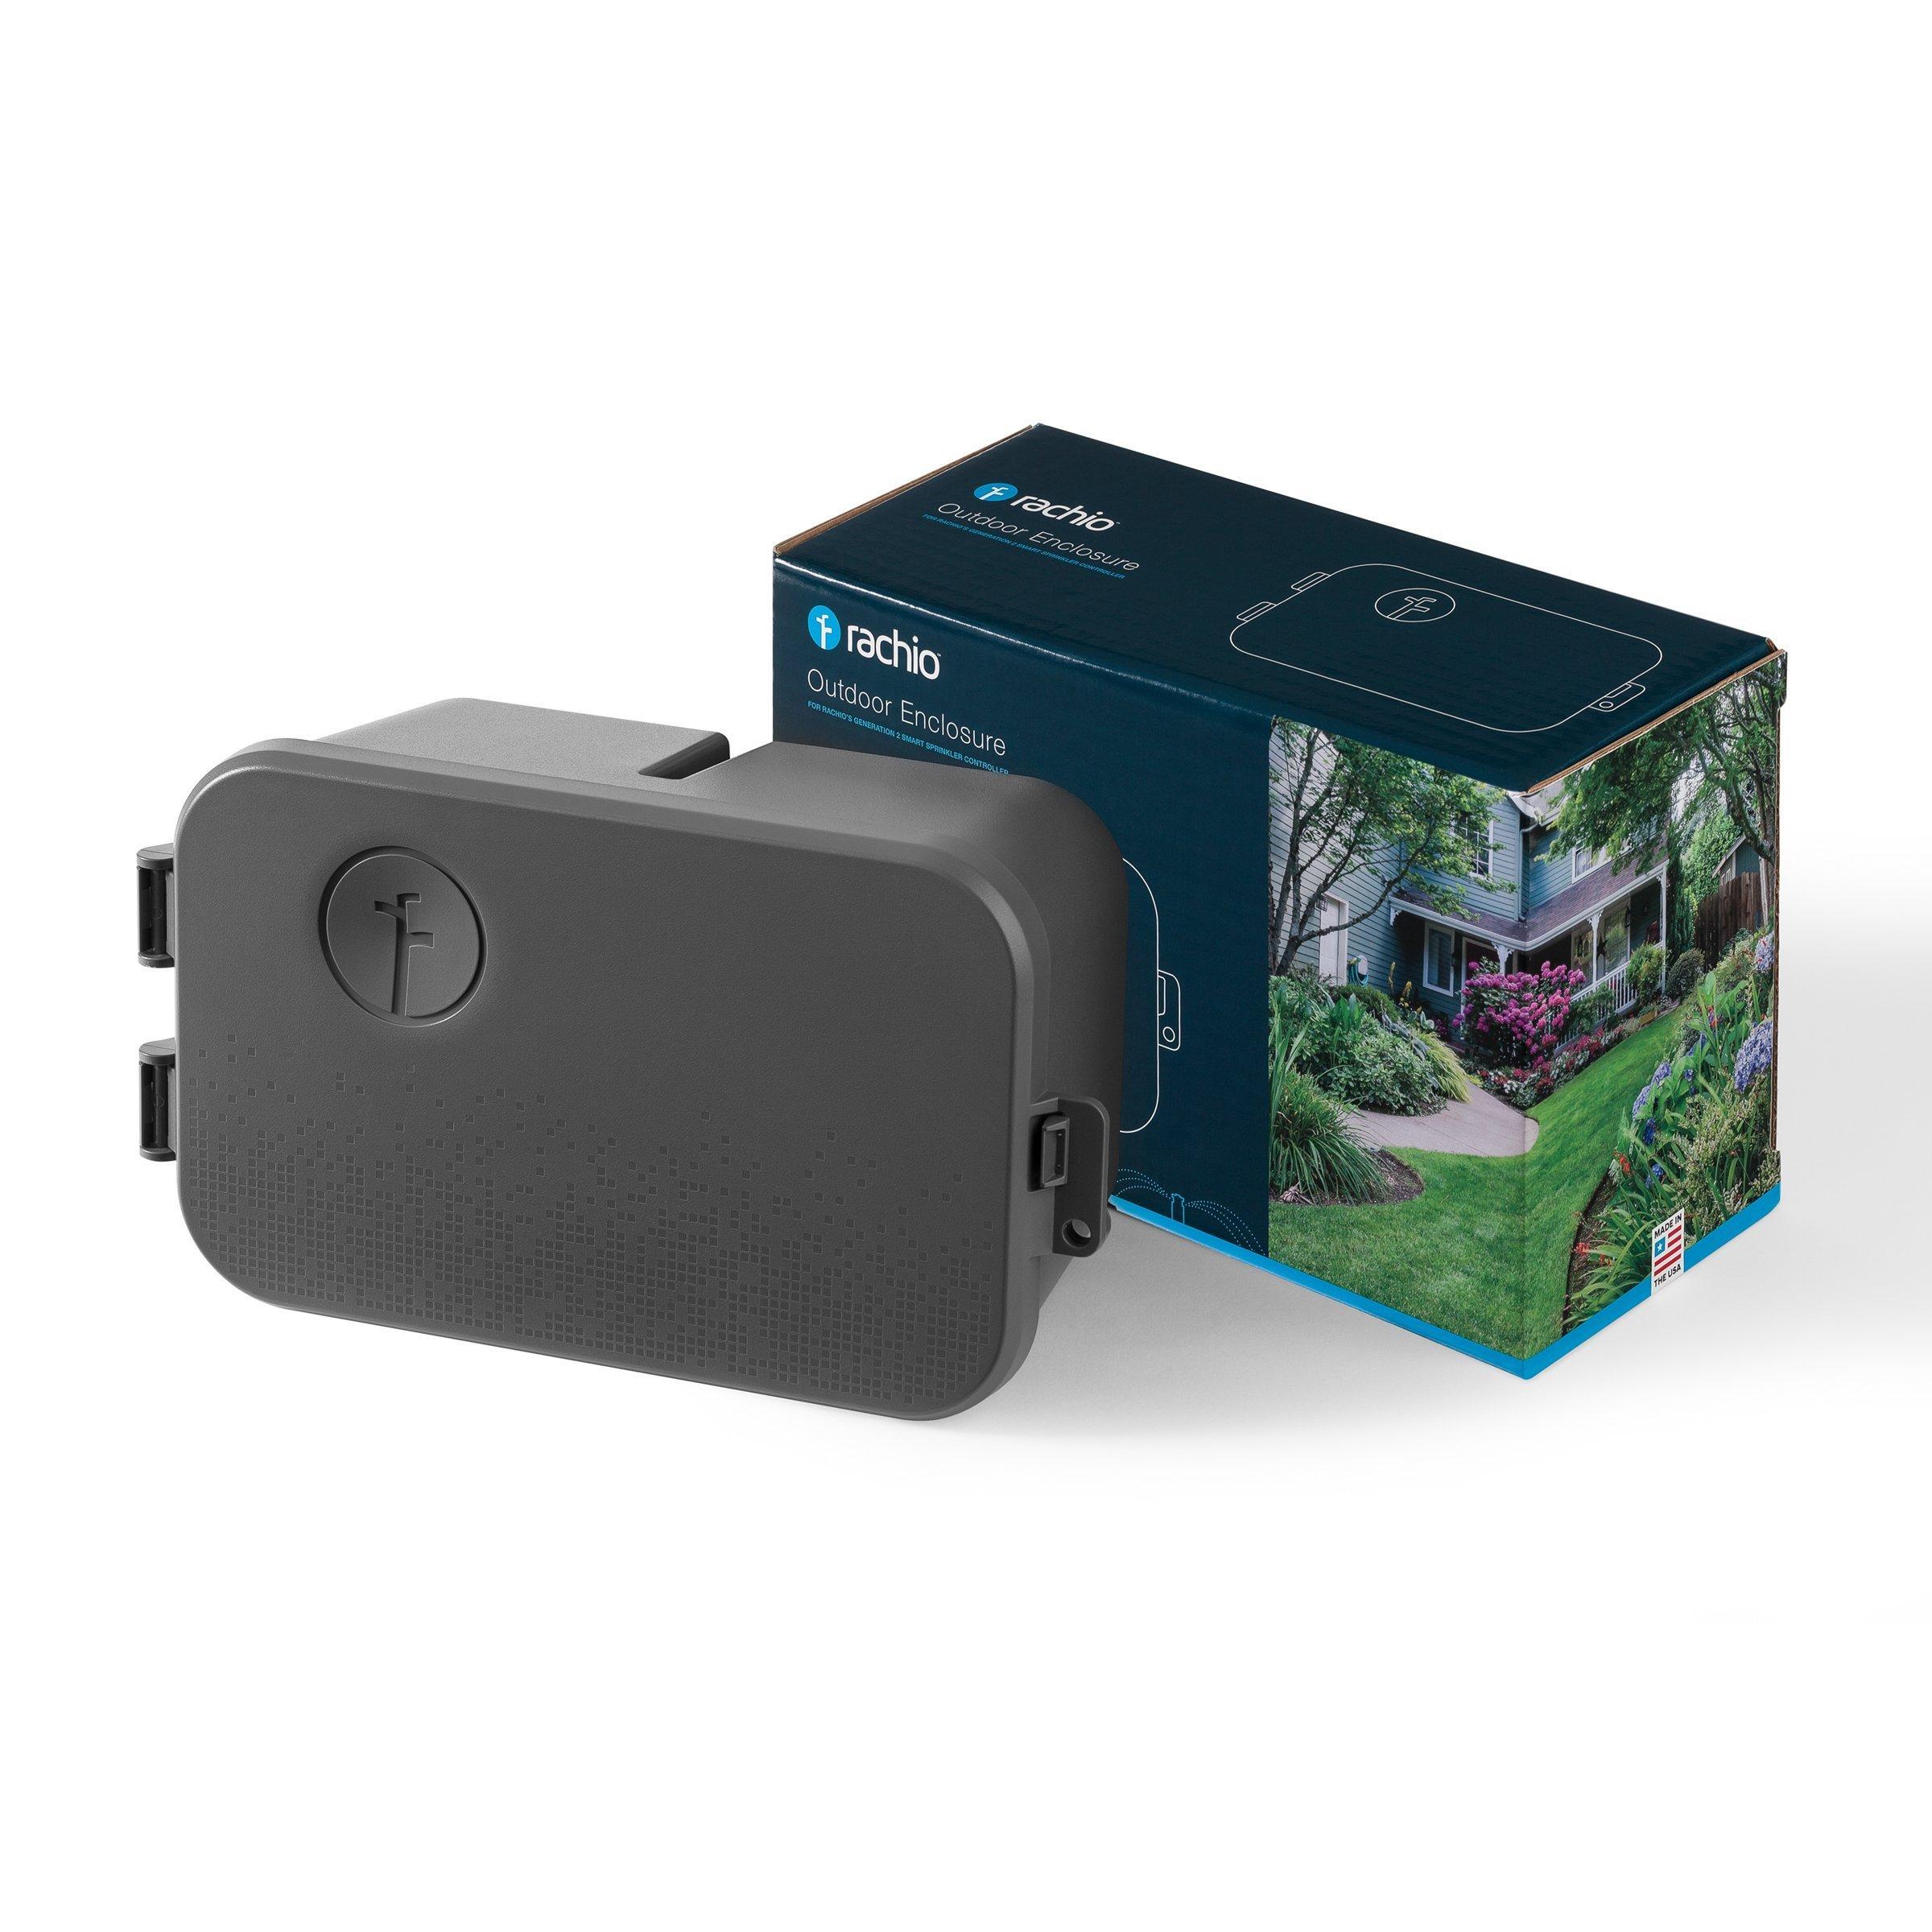 Rachio Outdoor Enclosure for Rachio 3 and Generation 2 Smart Sprinkler Controller by Rachio